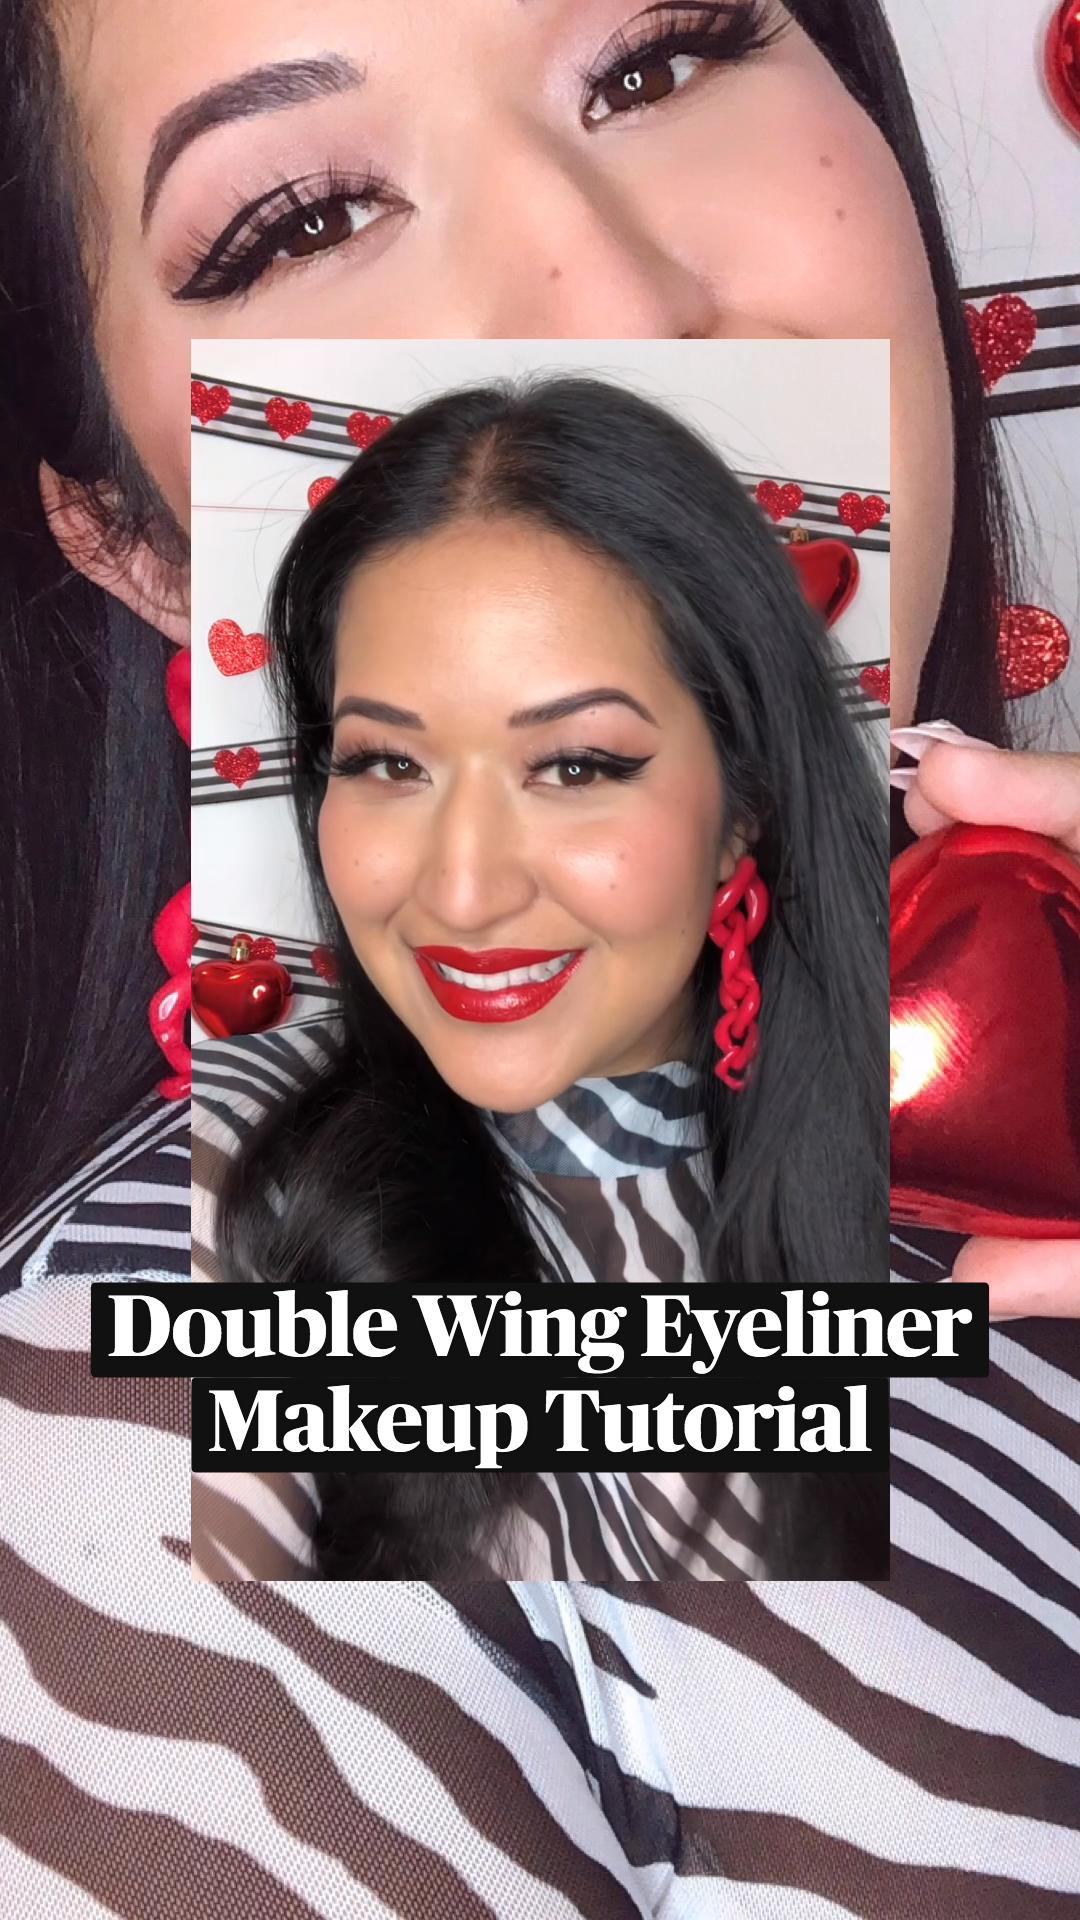 Double Winged EyelinerMakeup Tutorial